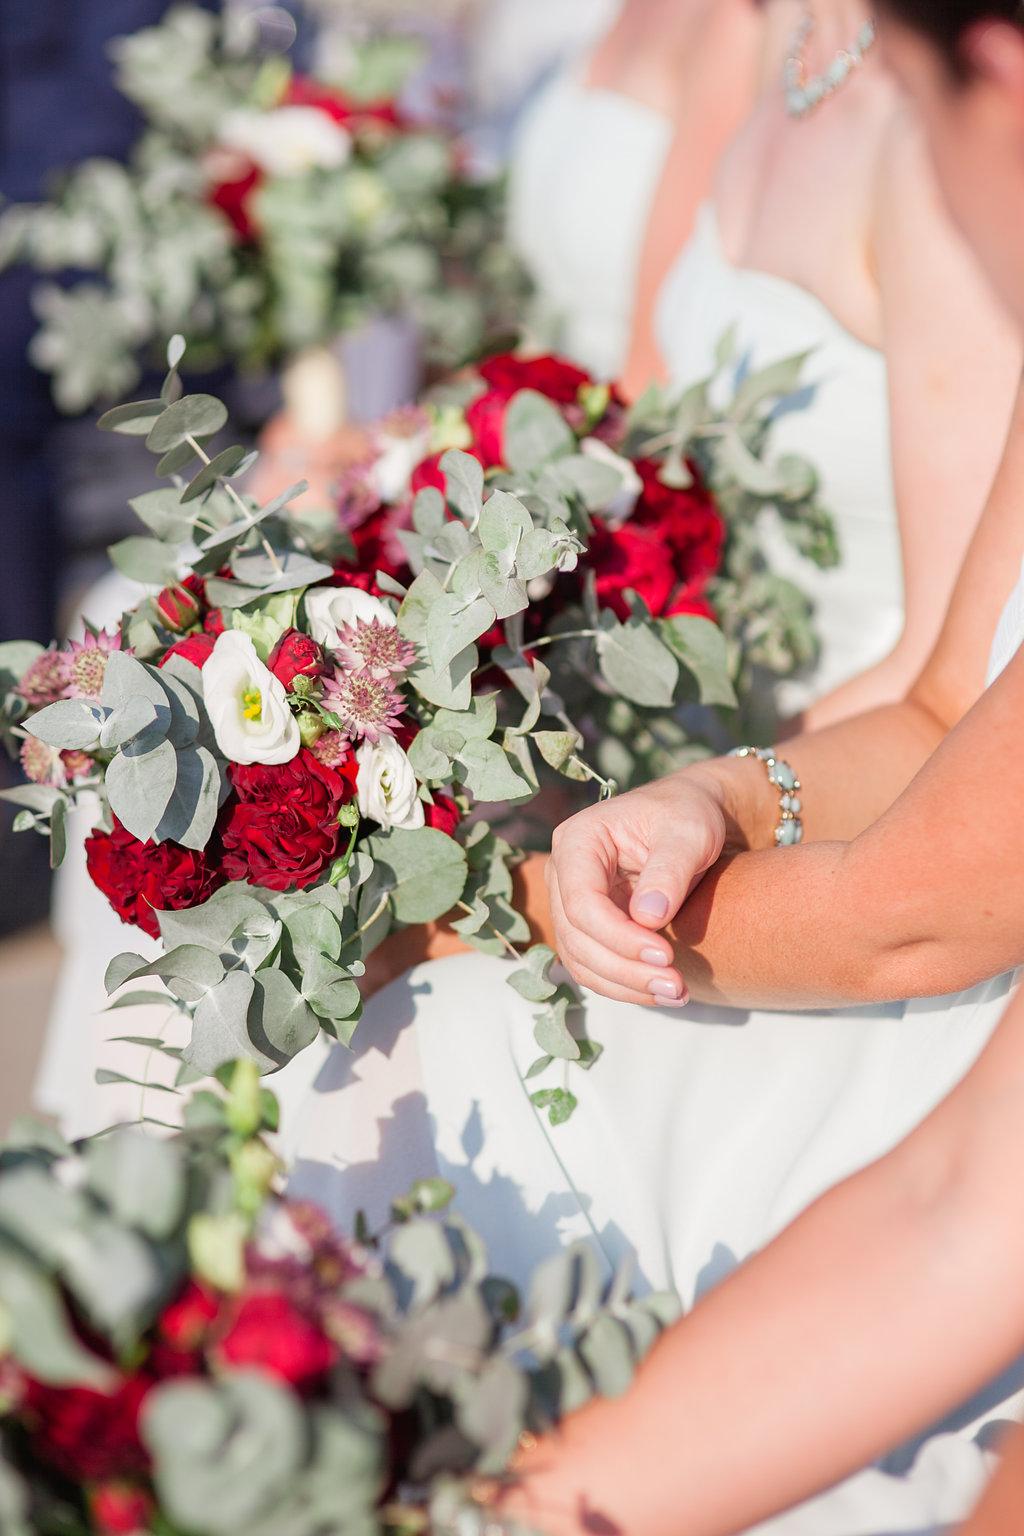 castelfalfi-tuscany-wedding-photographer-roberta-facchini-212